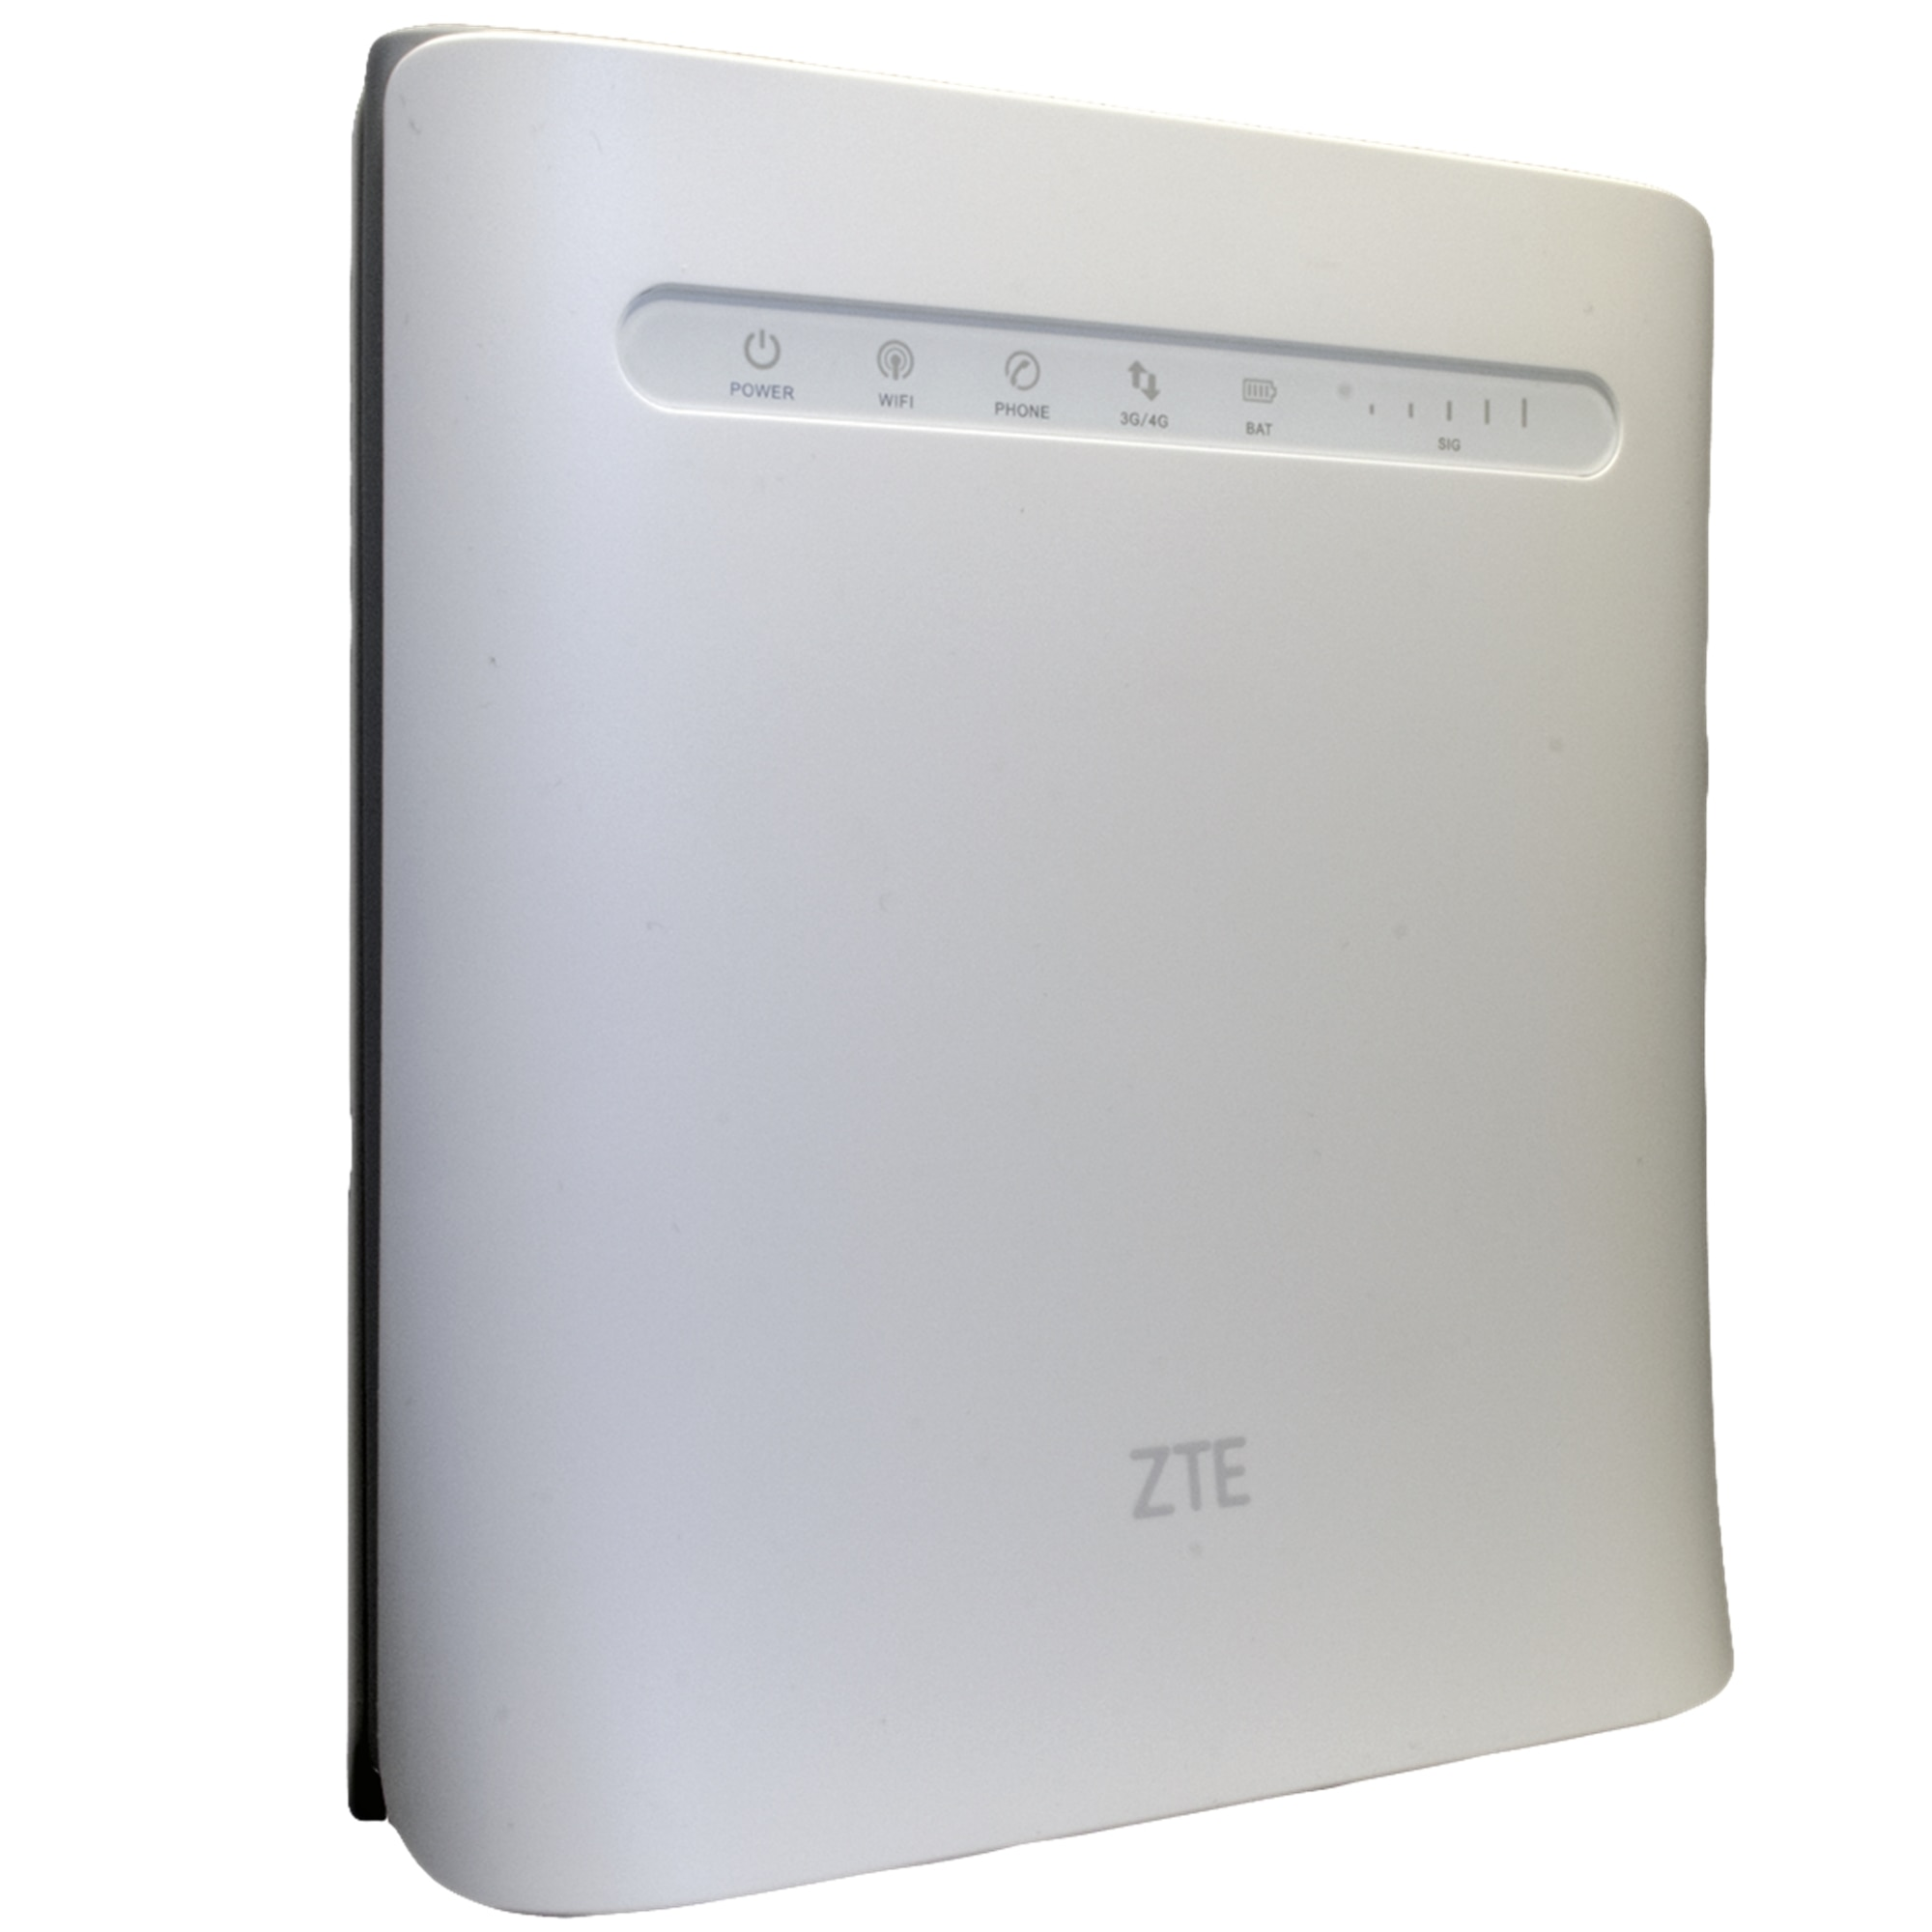 Fotografie Router Wireless ZTE MF286, Gigabit, Dual Band, 450 + 867 Mbps, 4G